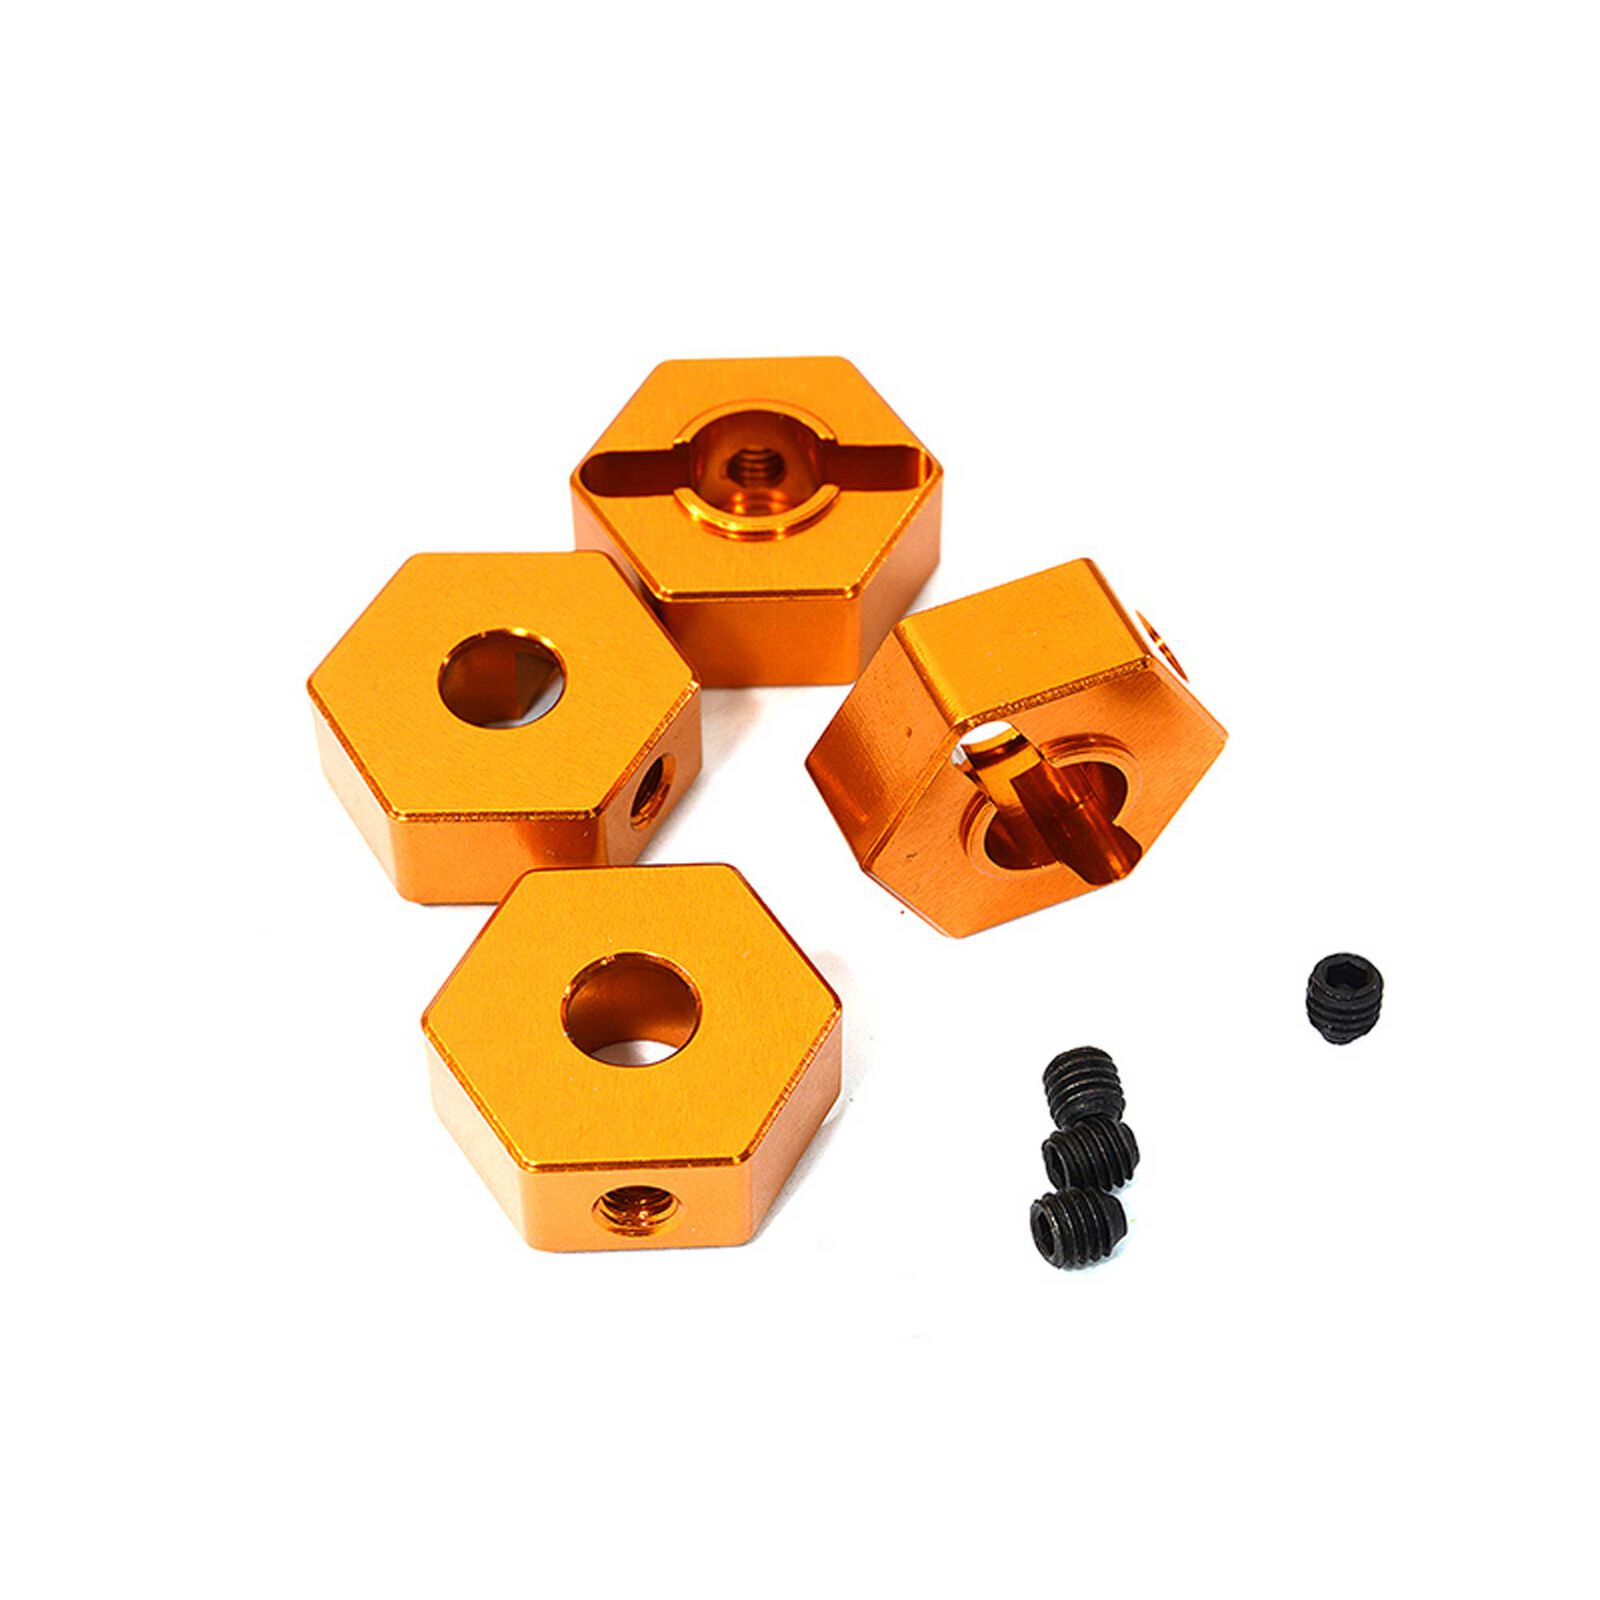 Wheel Hex, Orange (4): ARRMA 1/10 GRANITE 4x4 3S BLX